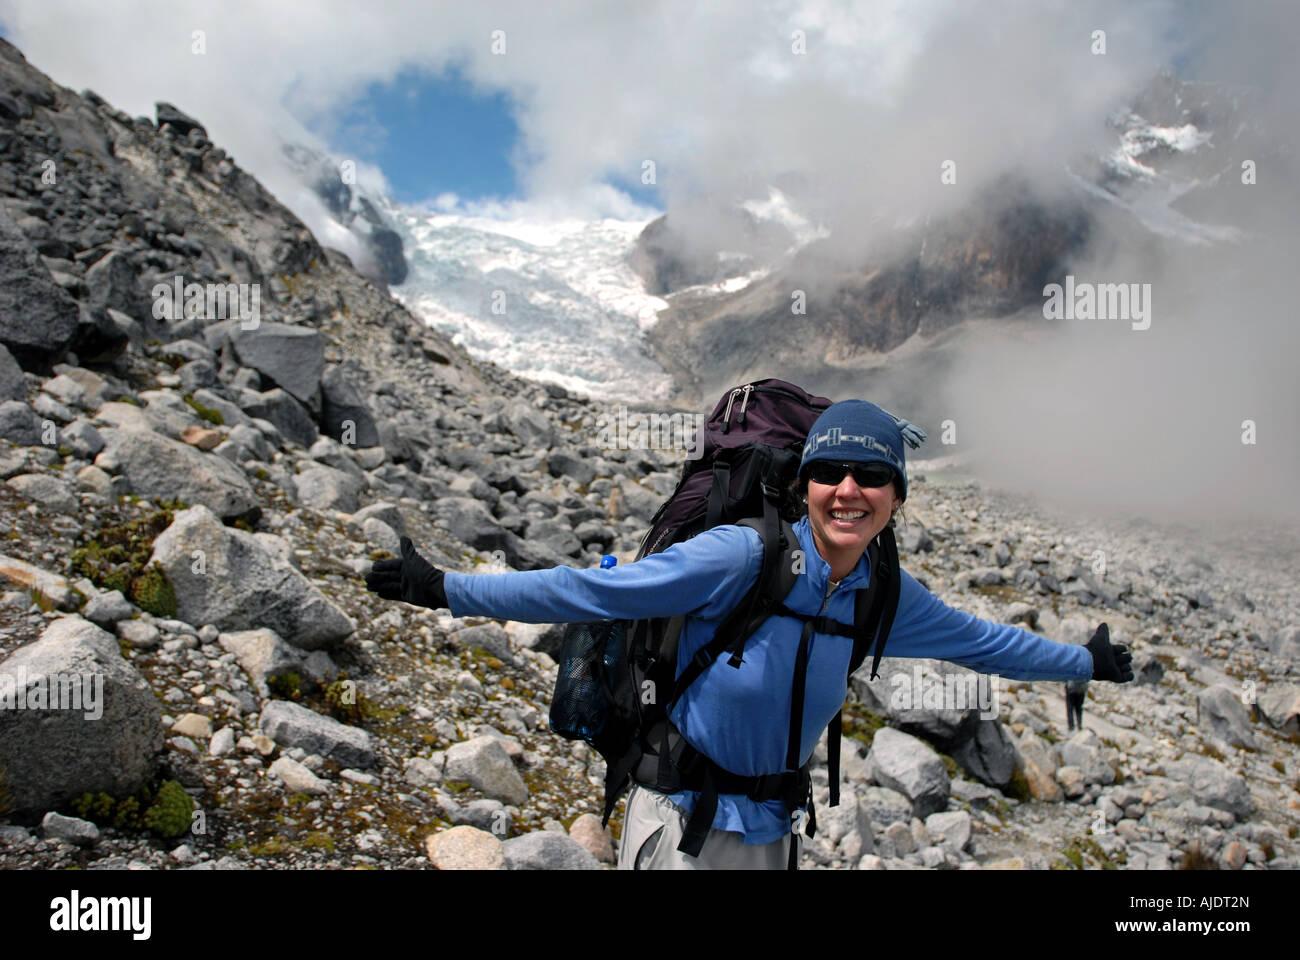 A woman smiles in front of Lagunas Glaciar at 5,038 meters below Mount Illampu near Sorata, Bolivia, South America. - Stock Image